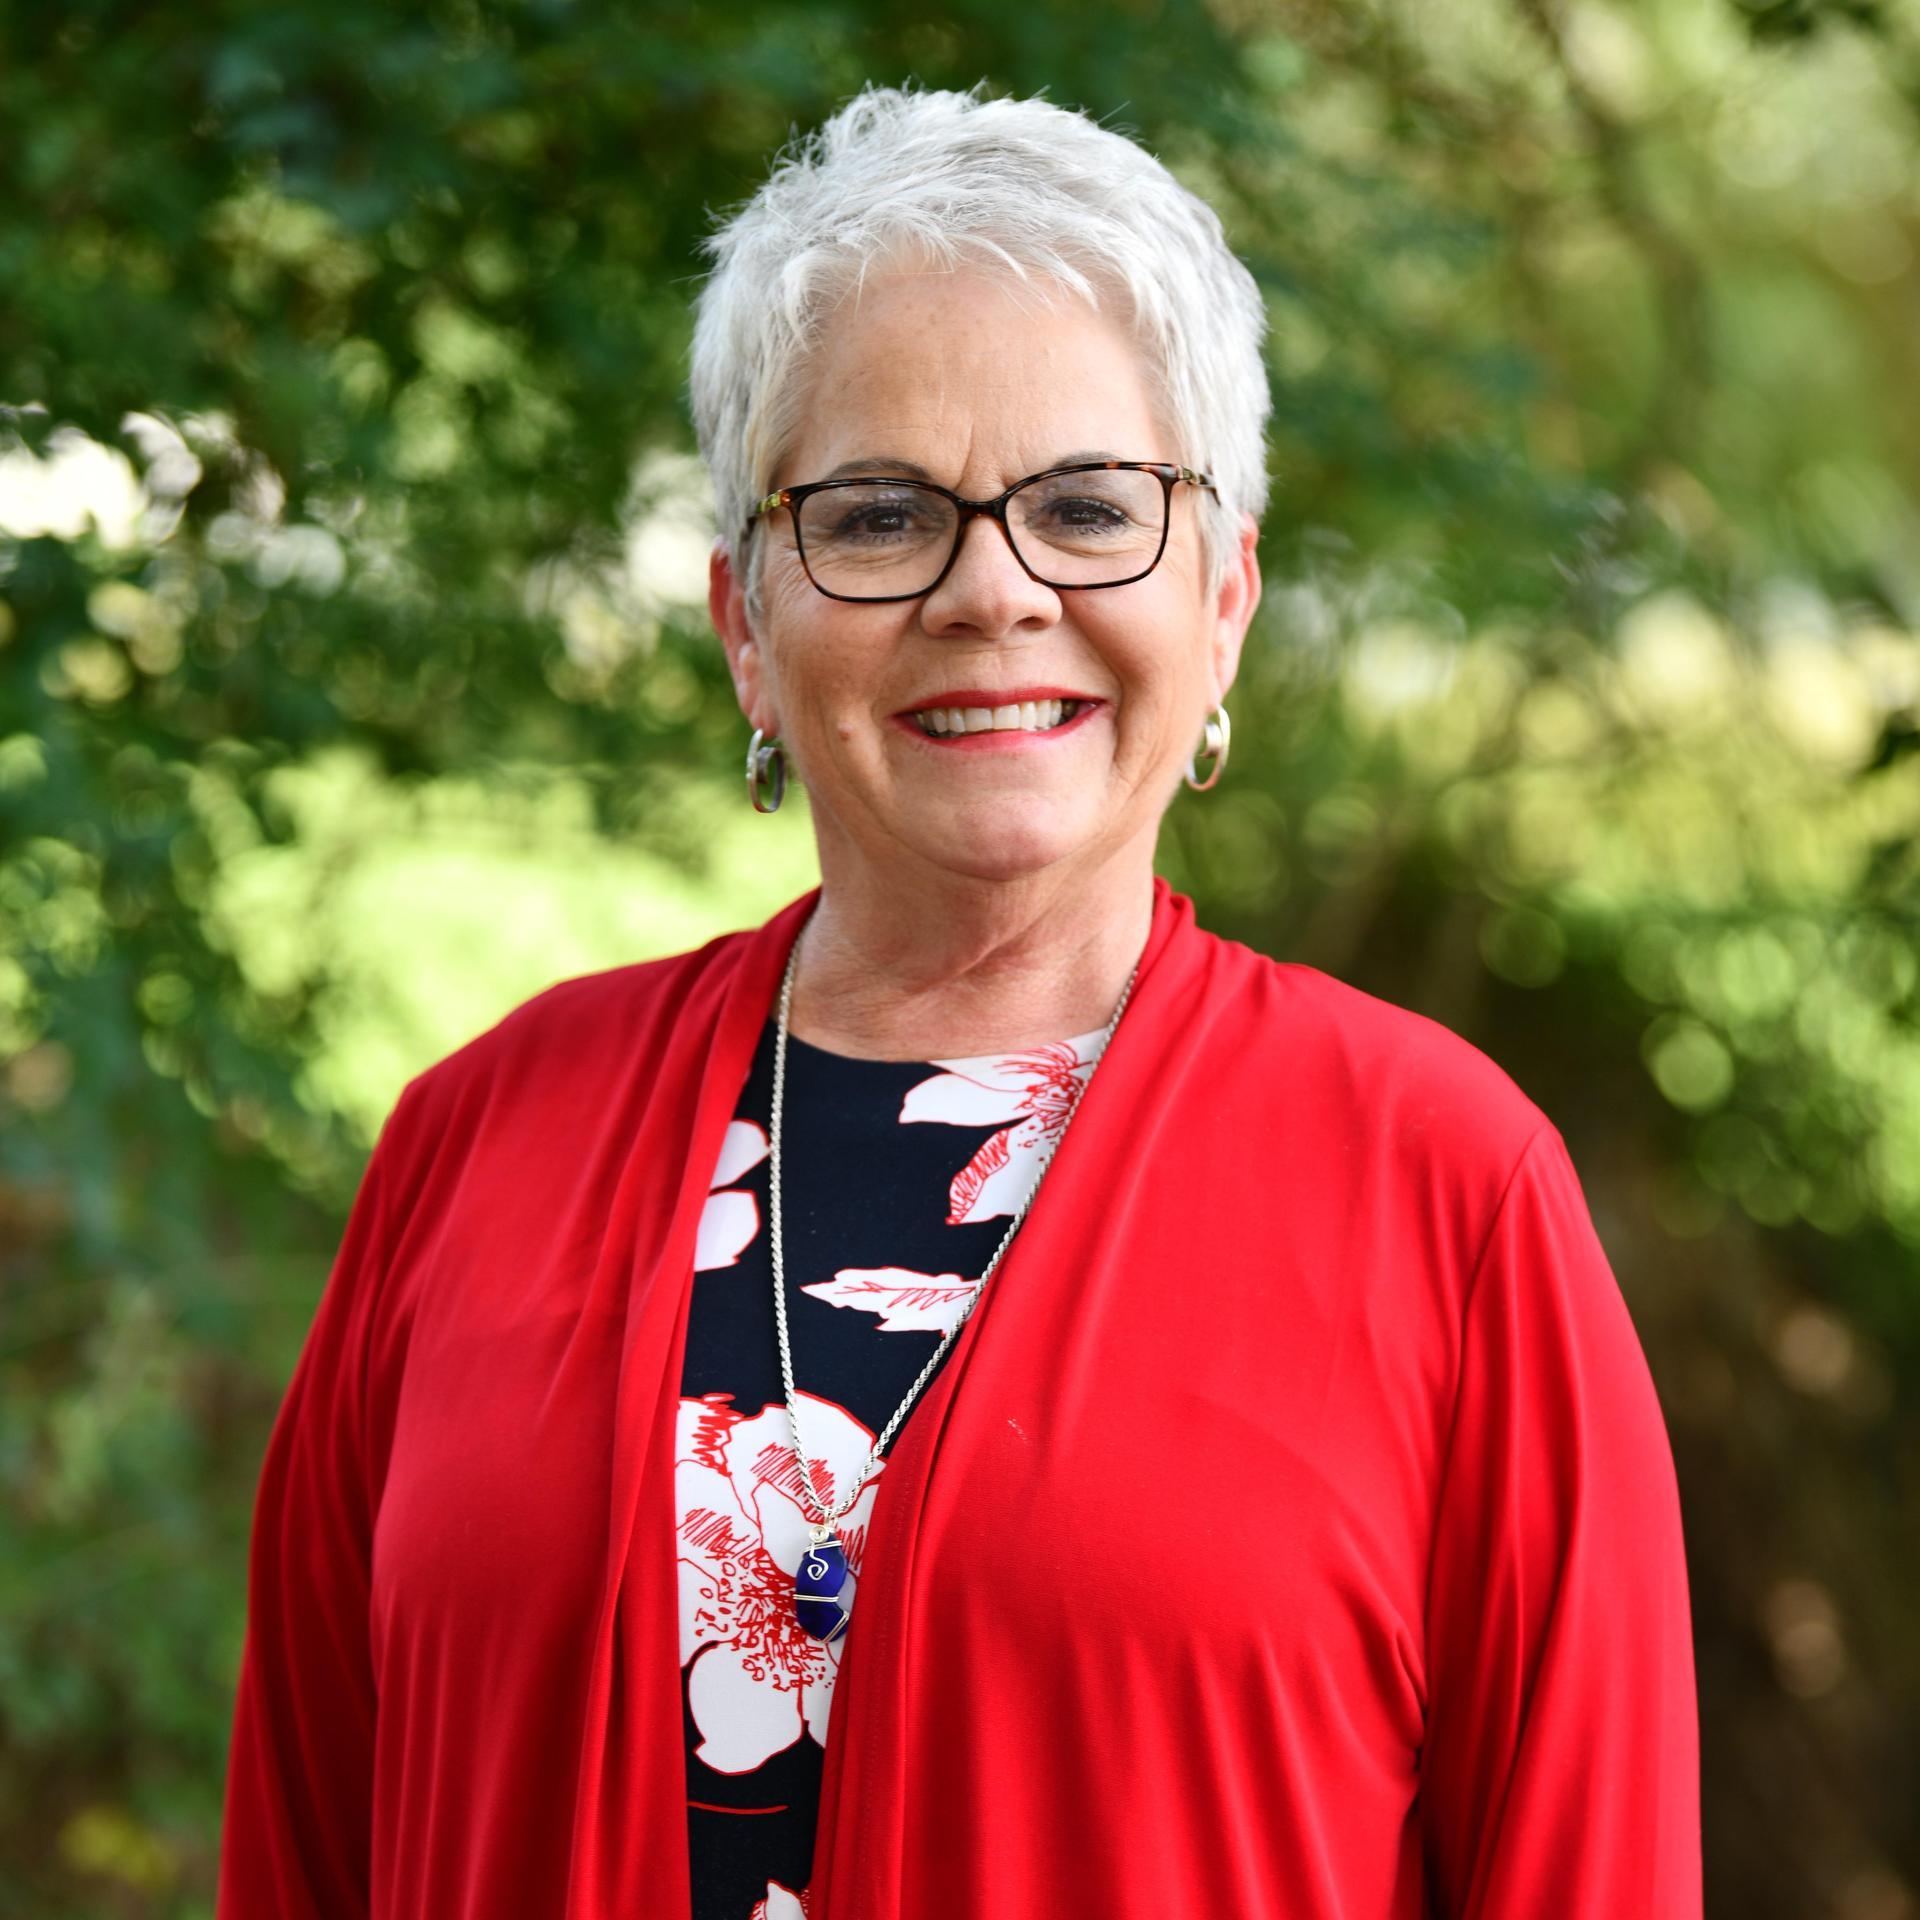 Mrs. Susan Keller - Westminster Lafayette Elementary Principal & Preschool Director